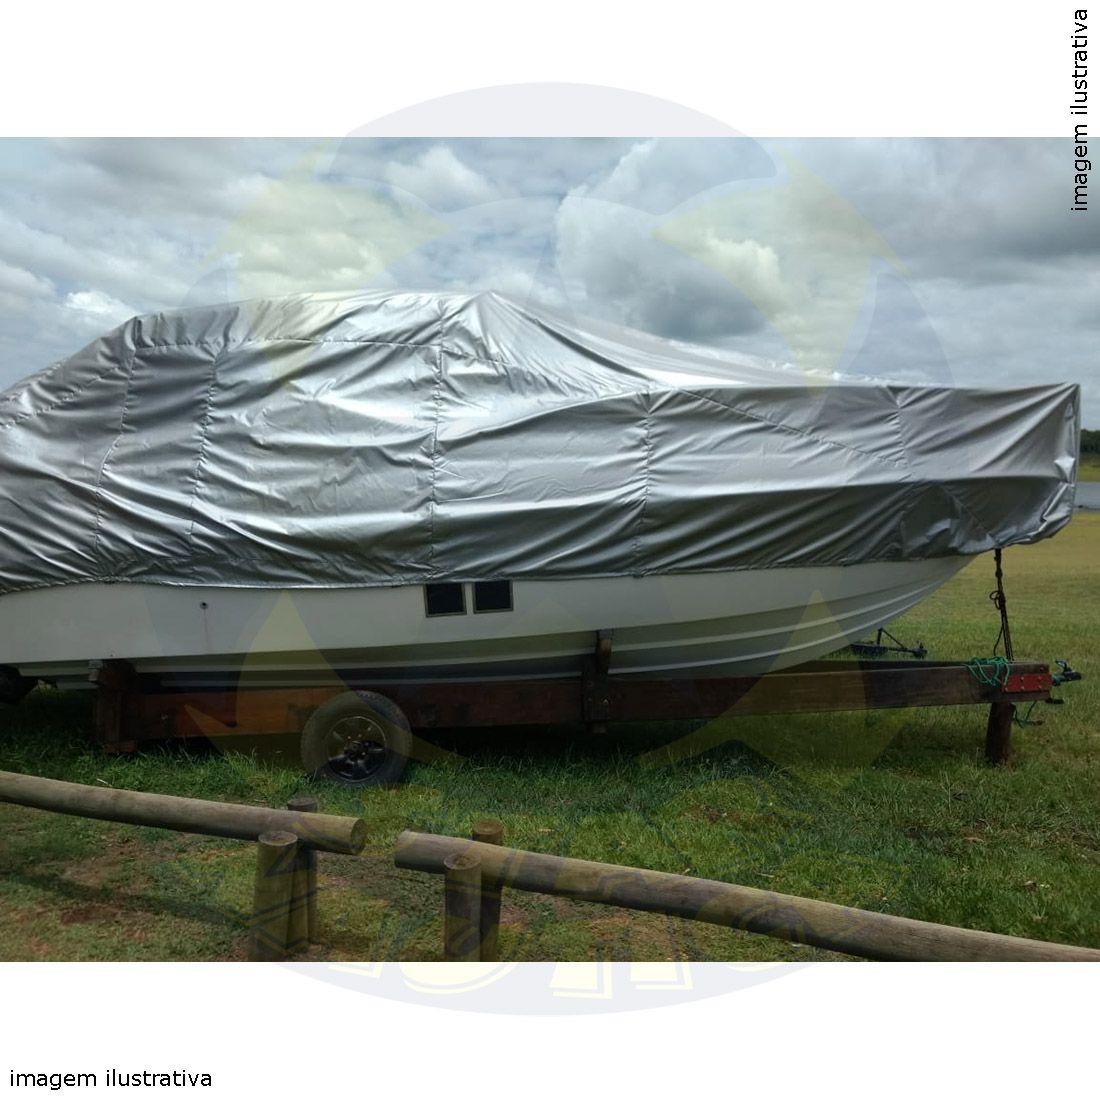 Capa Lona de Cobertura Lancha FS 230 Sirena com Targa Lona Metalizada